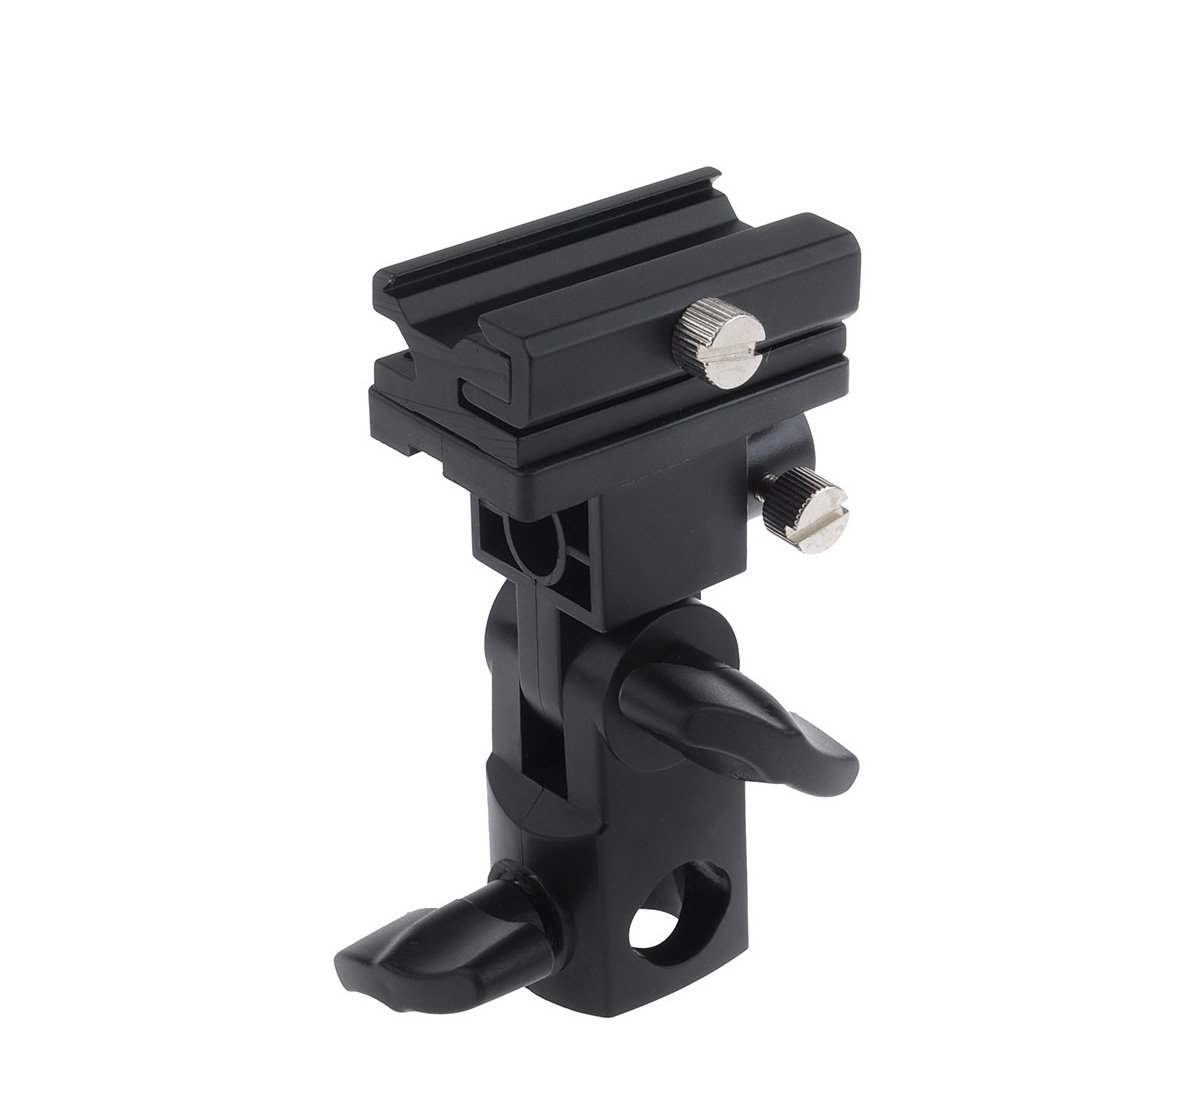 Amazon.com : Godox Flash Bracket Speedlite Monte Swivel Light Stand Soporte para paraguas Studio inclinable para Canon 430EX II, 580EX II, 600EX-RT, ...